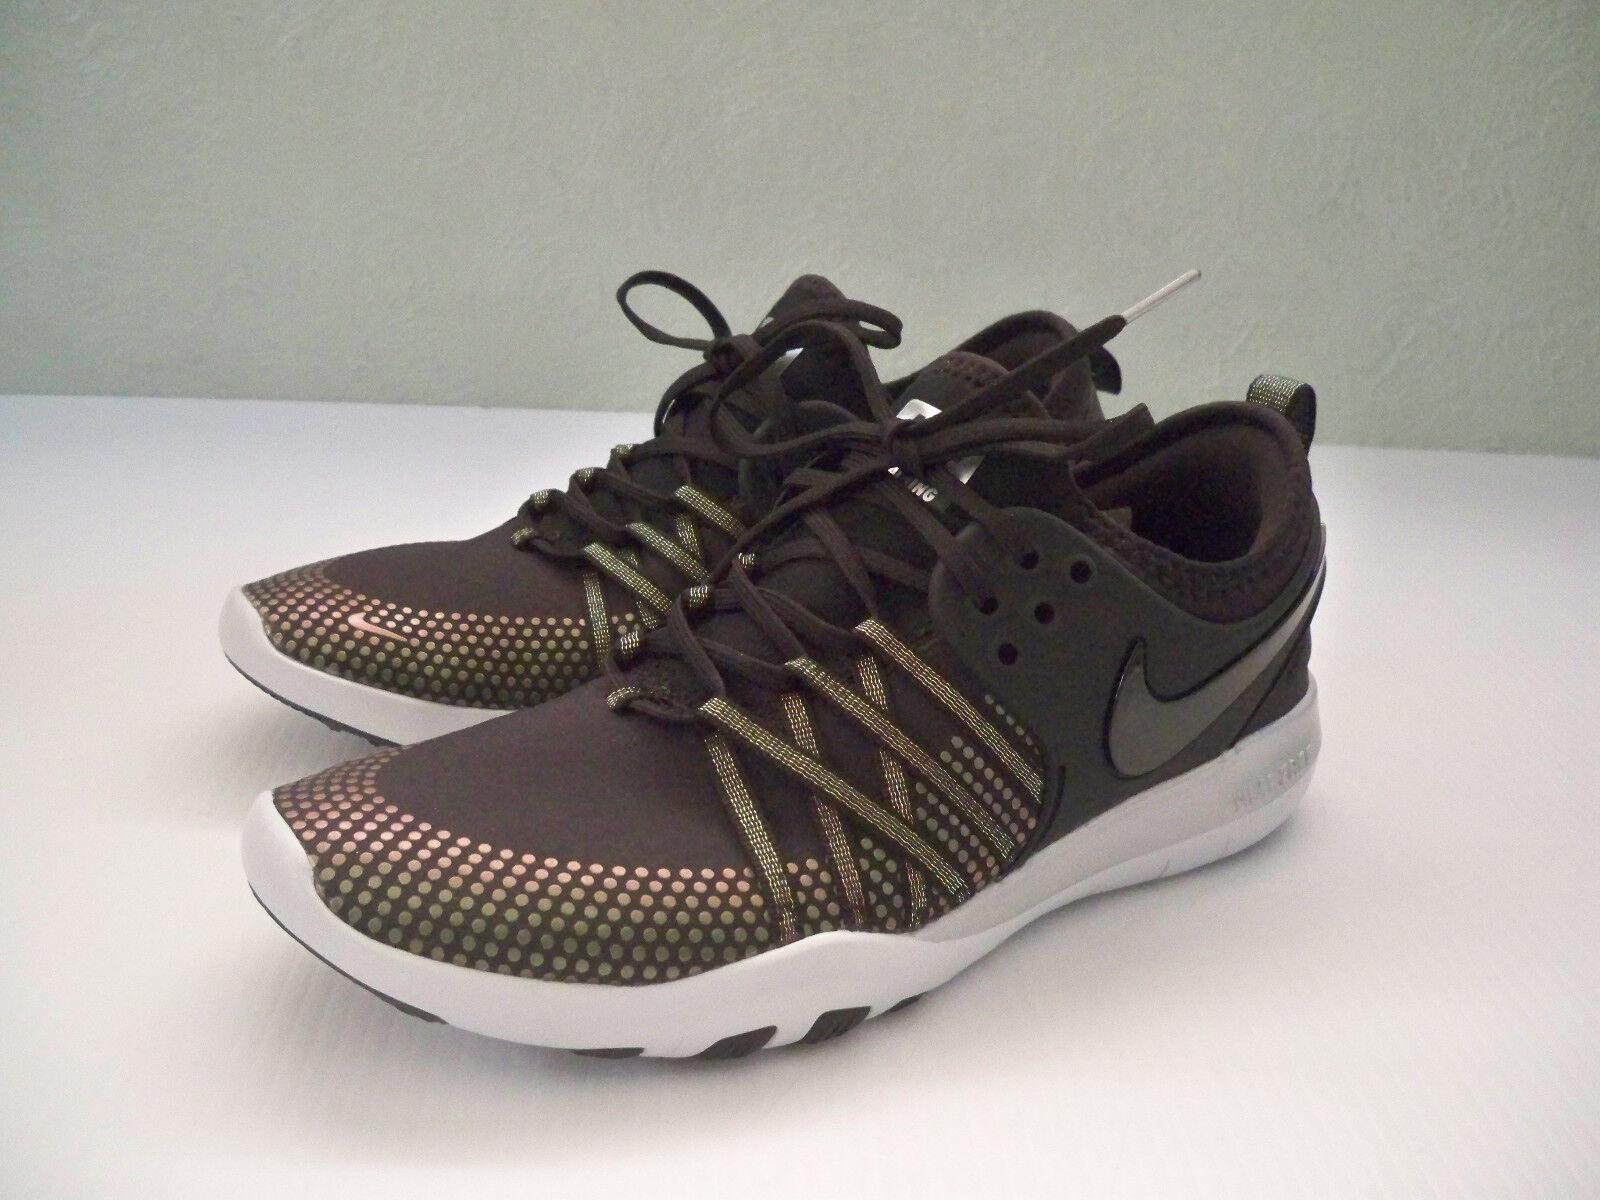 sports shoes a3600 8c193 NEW Womens Nike Free TR 7 Metallic Training Running shoes shoes shoes Black  SZ 6.5 Display